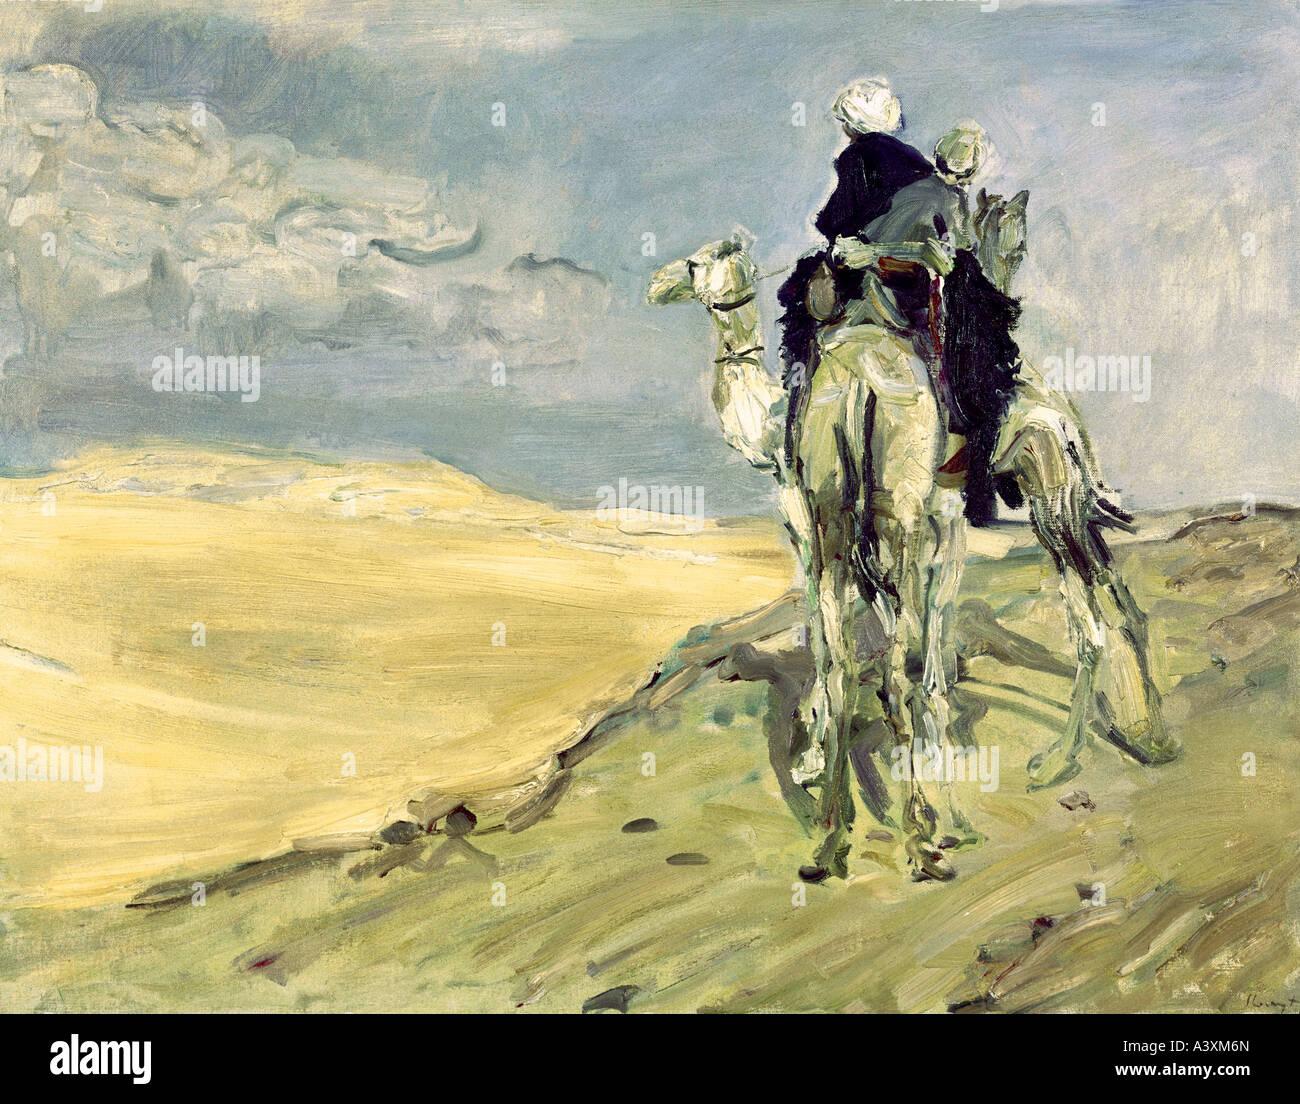 """Bildende Kunst, Slevogt, Max (8.10.1868 - 20.9.1932), Malerei""Sandsturm in der Wüste"", 1914, Gemäldegalerie Dresden Stockfoto"